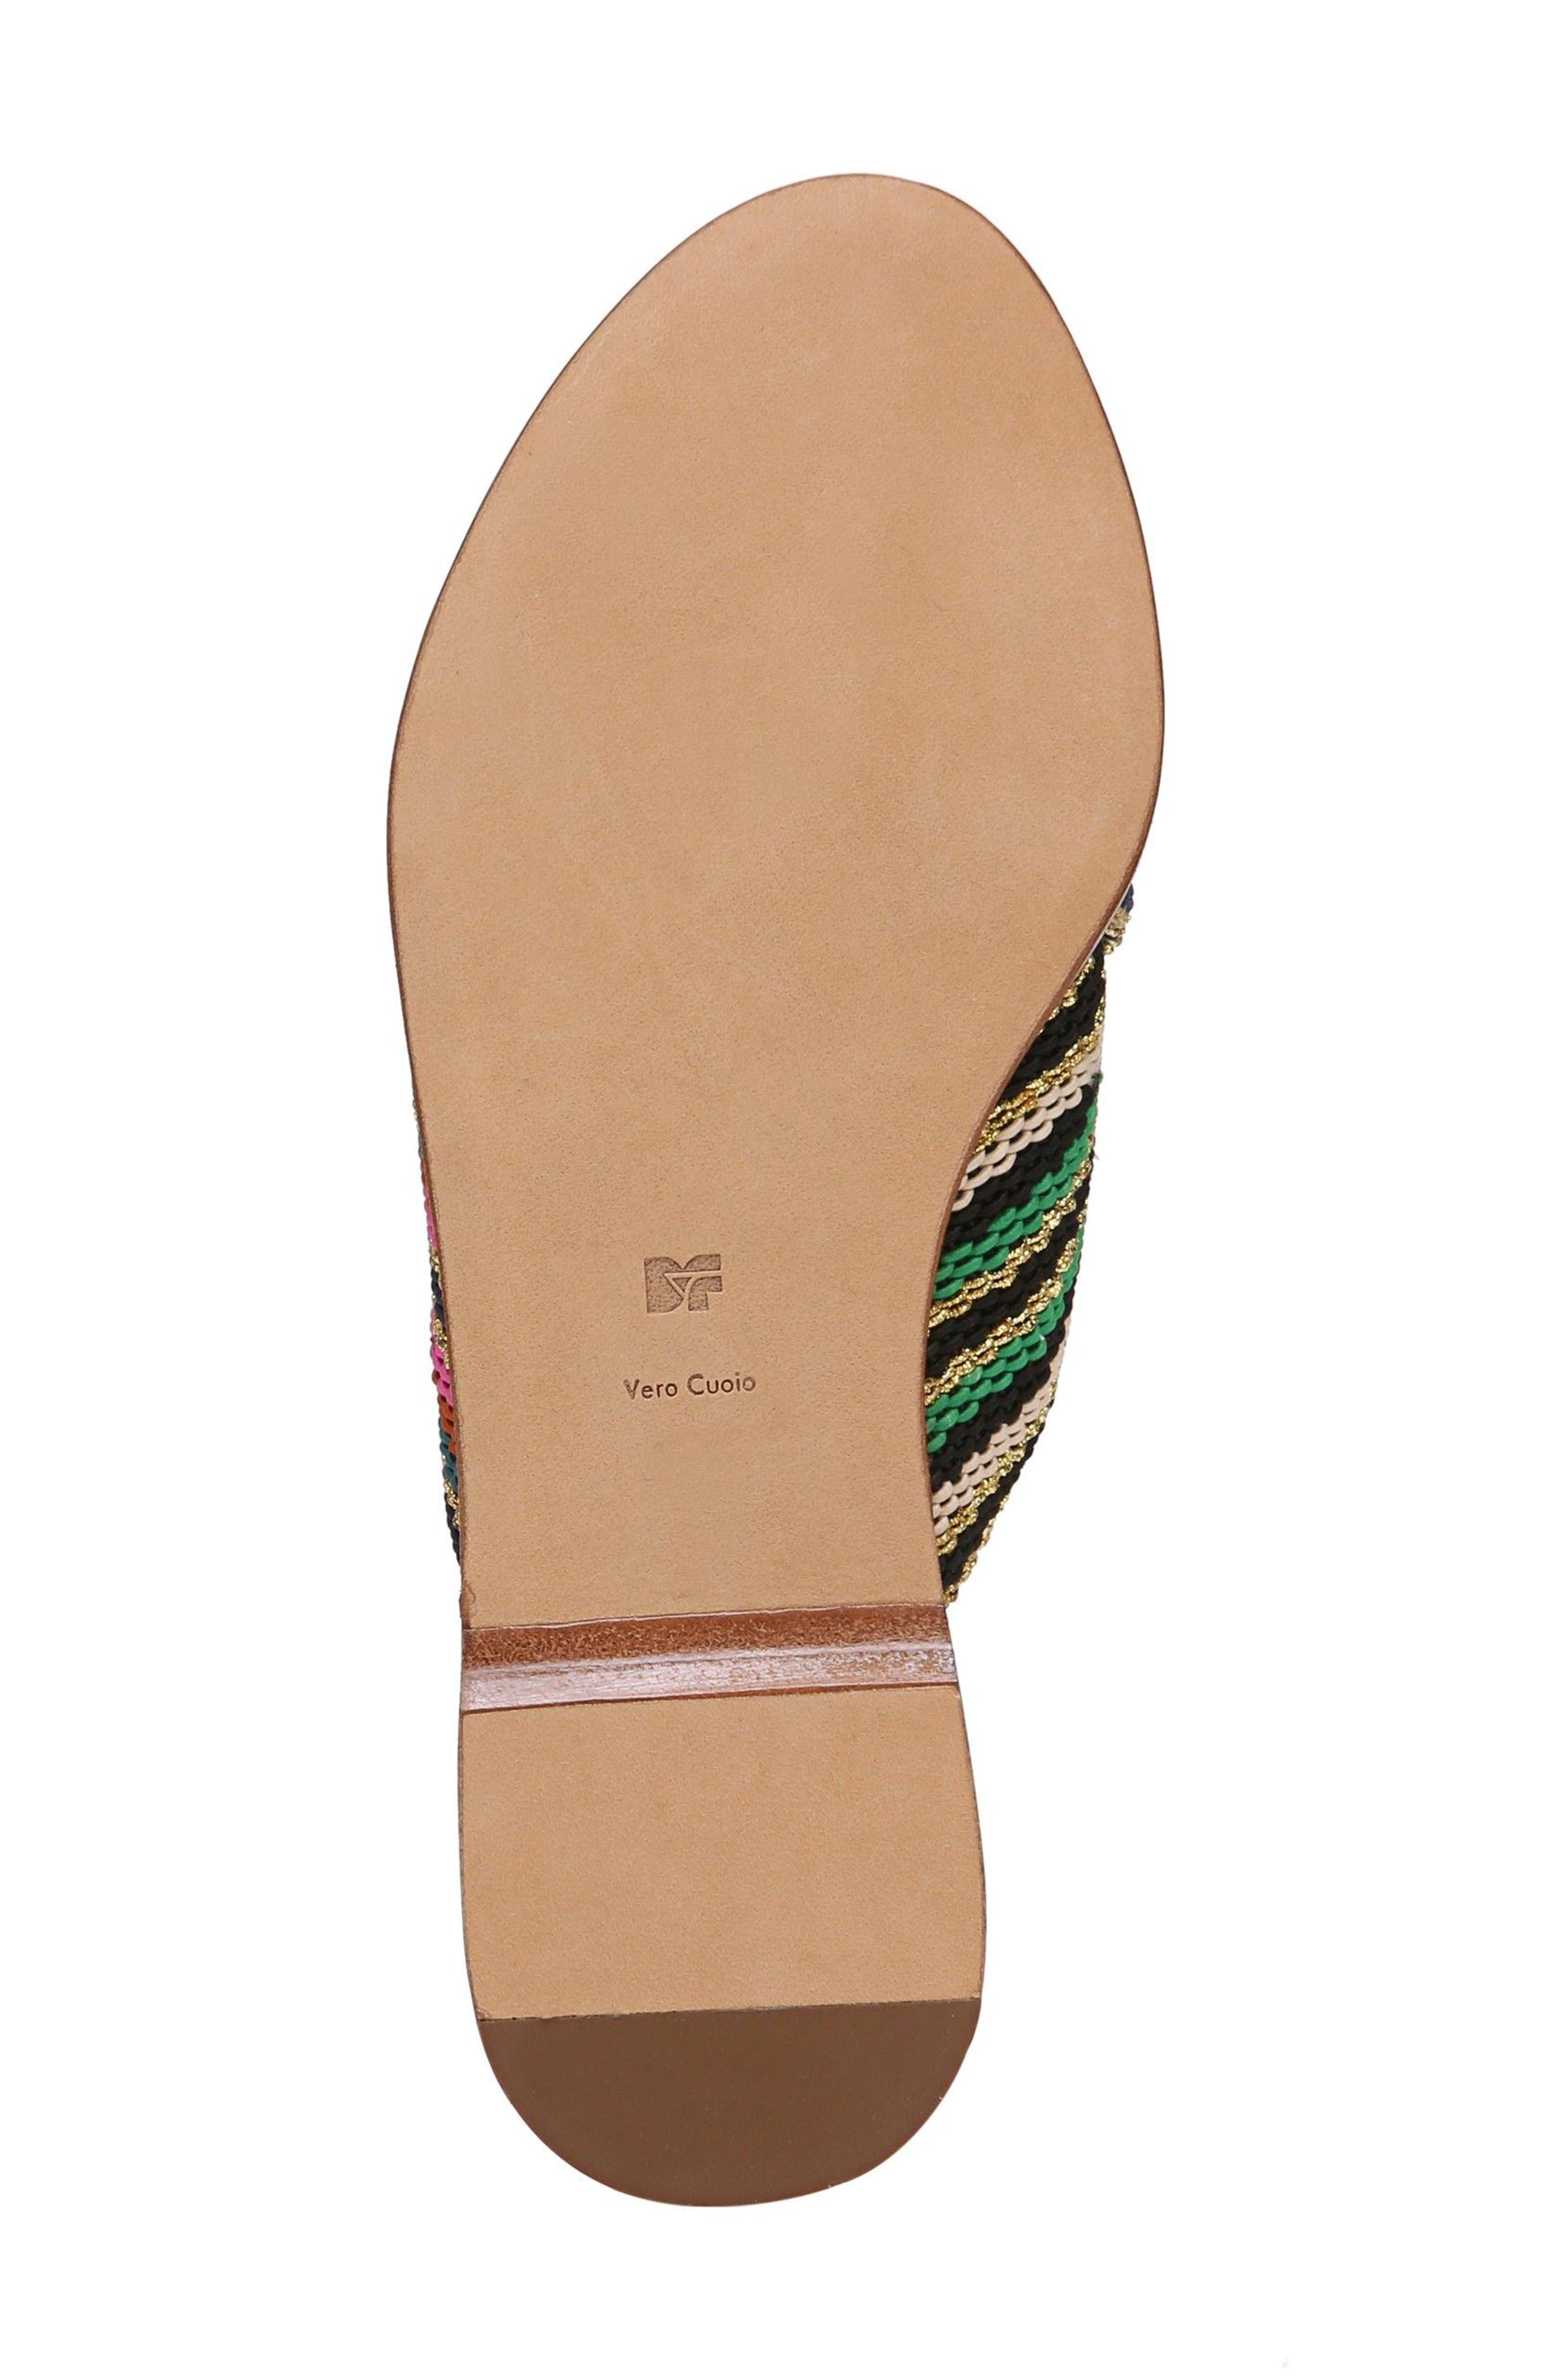 Cindi Woven Slide Sandal,                             Alternate thumbnail 5, color,                             Black/ Gold